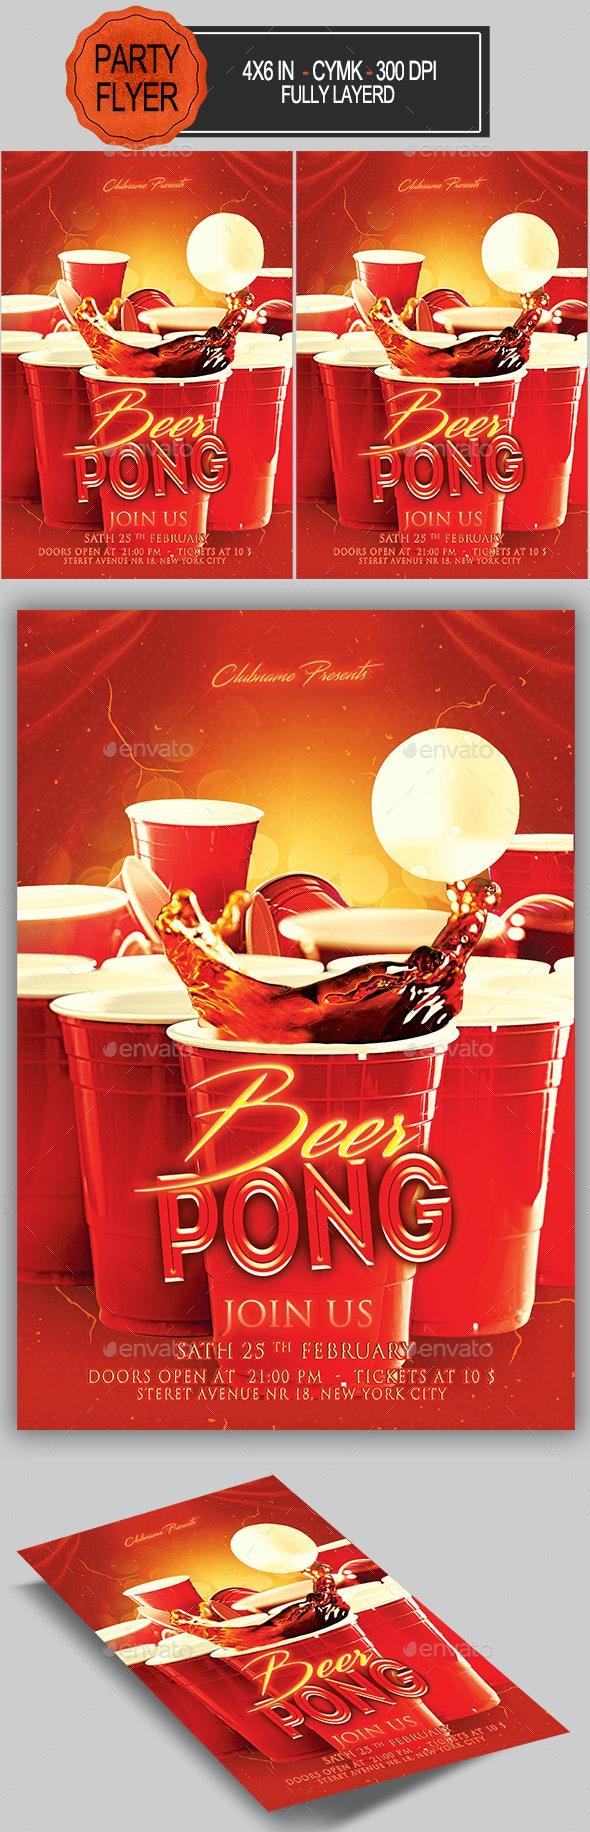 Beer Pong Flyer - Clubs & Parties Events